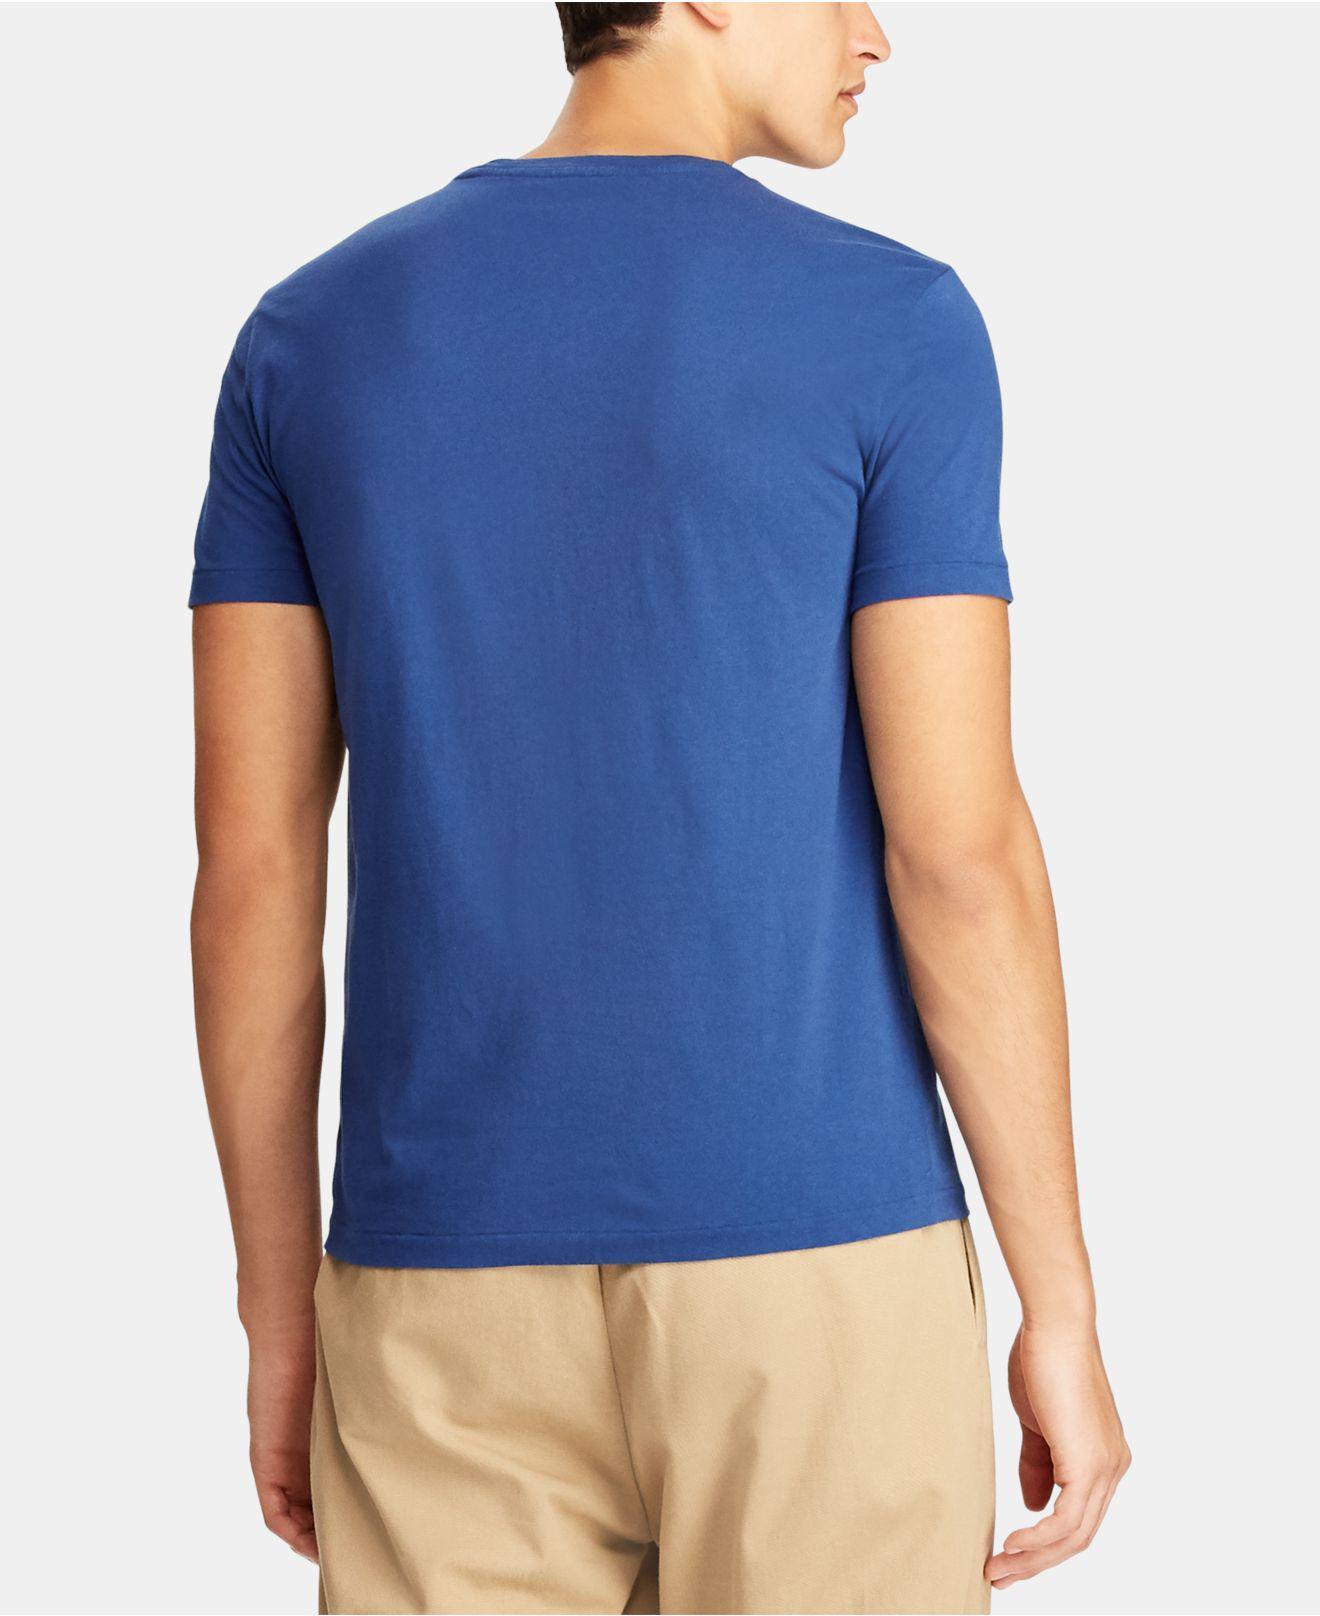 f85426606b359 Lyst - Polo Ralph Lauren Custom Slim Fit Cotton T-shirt in Blue for Men